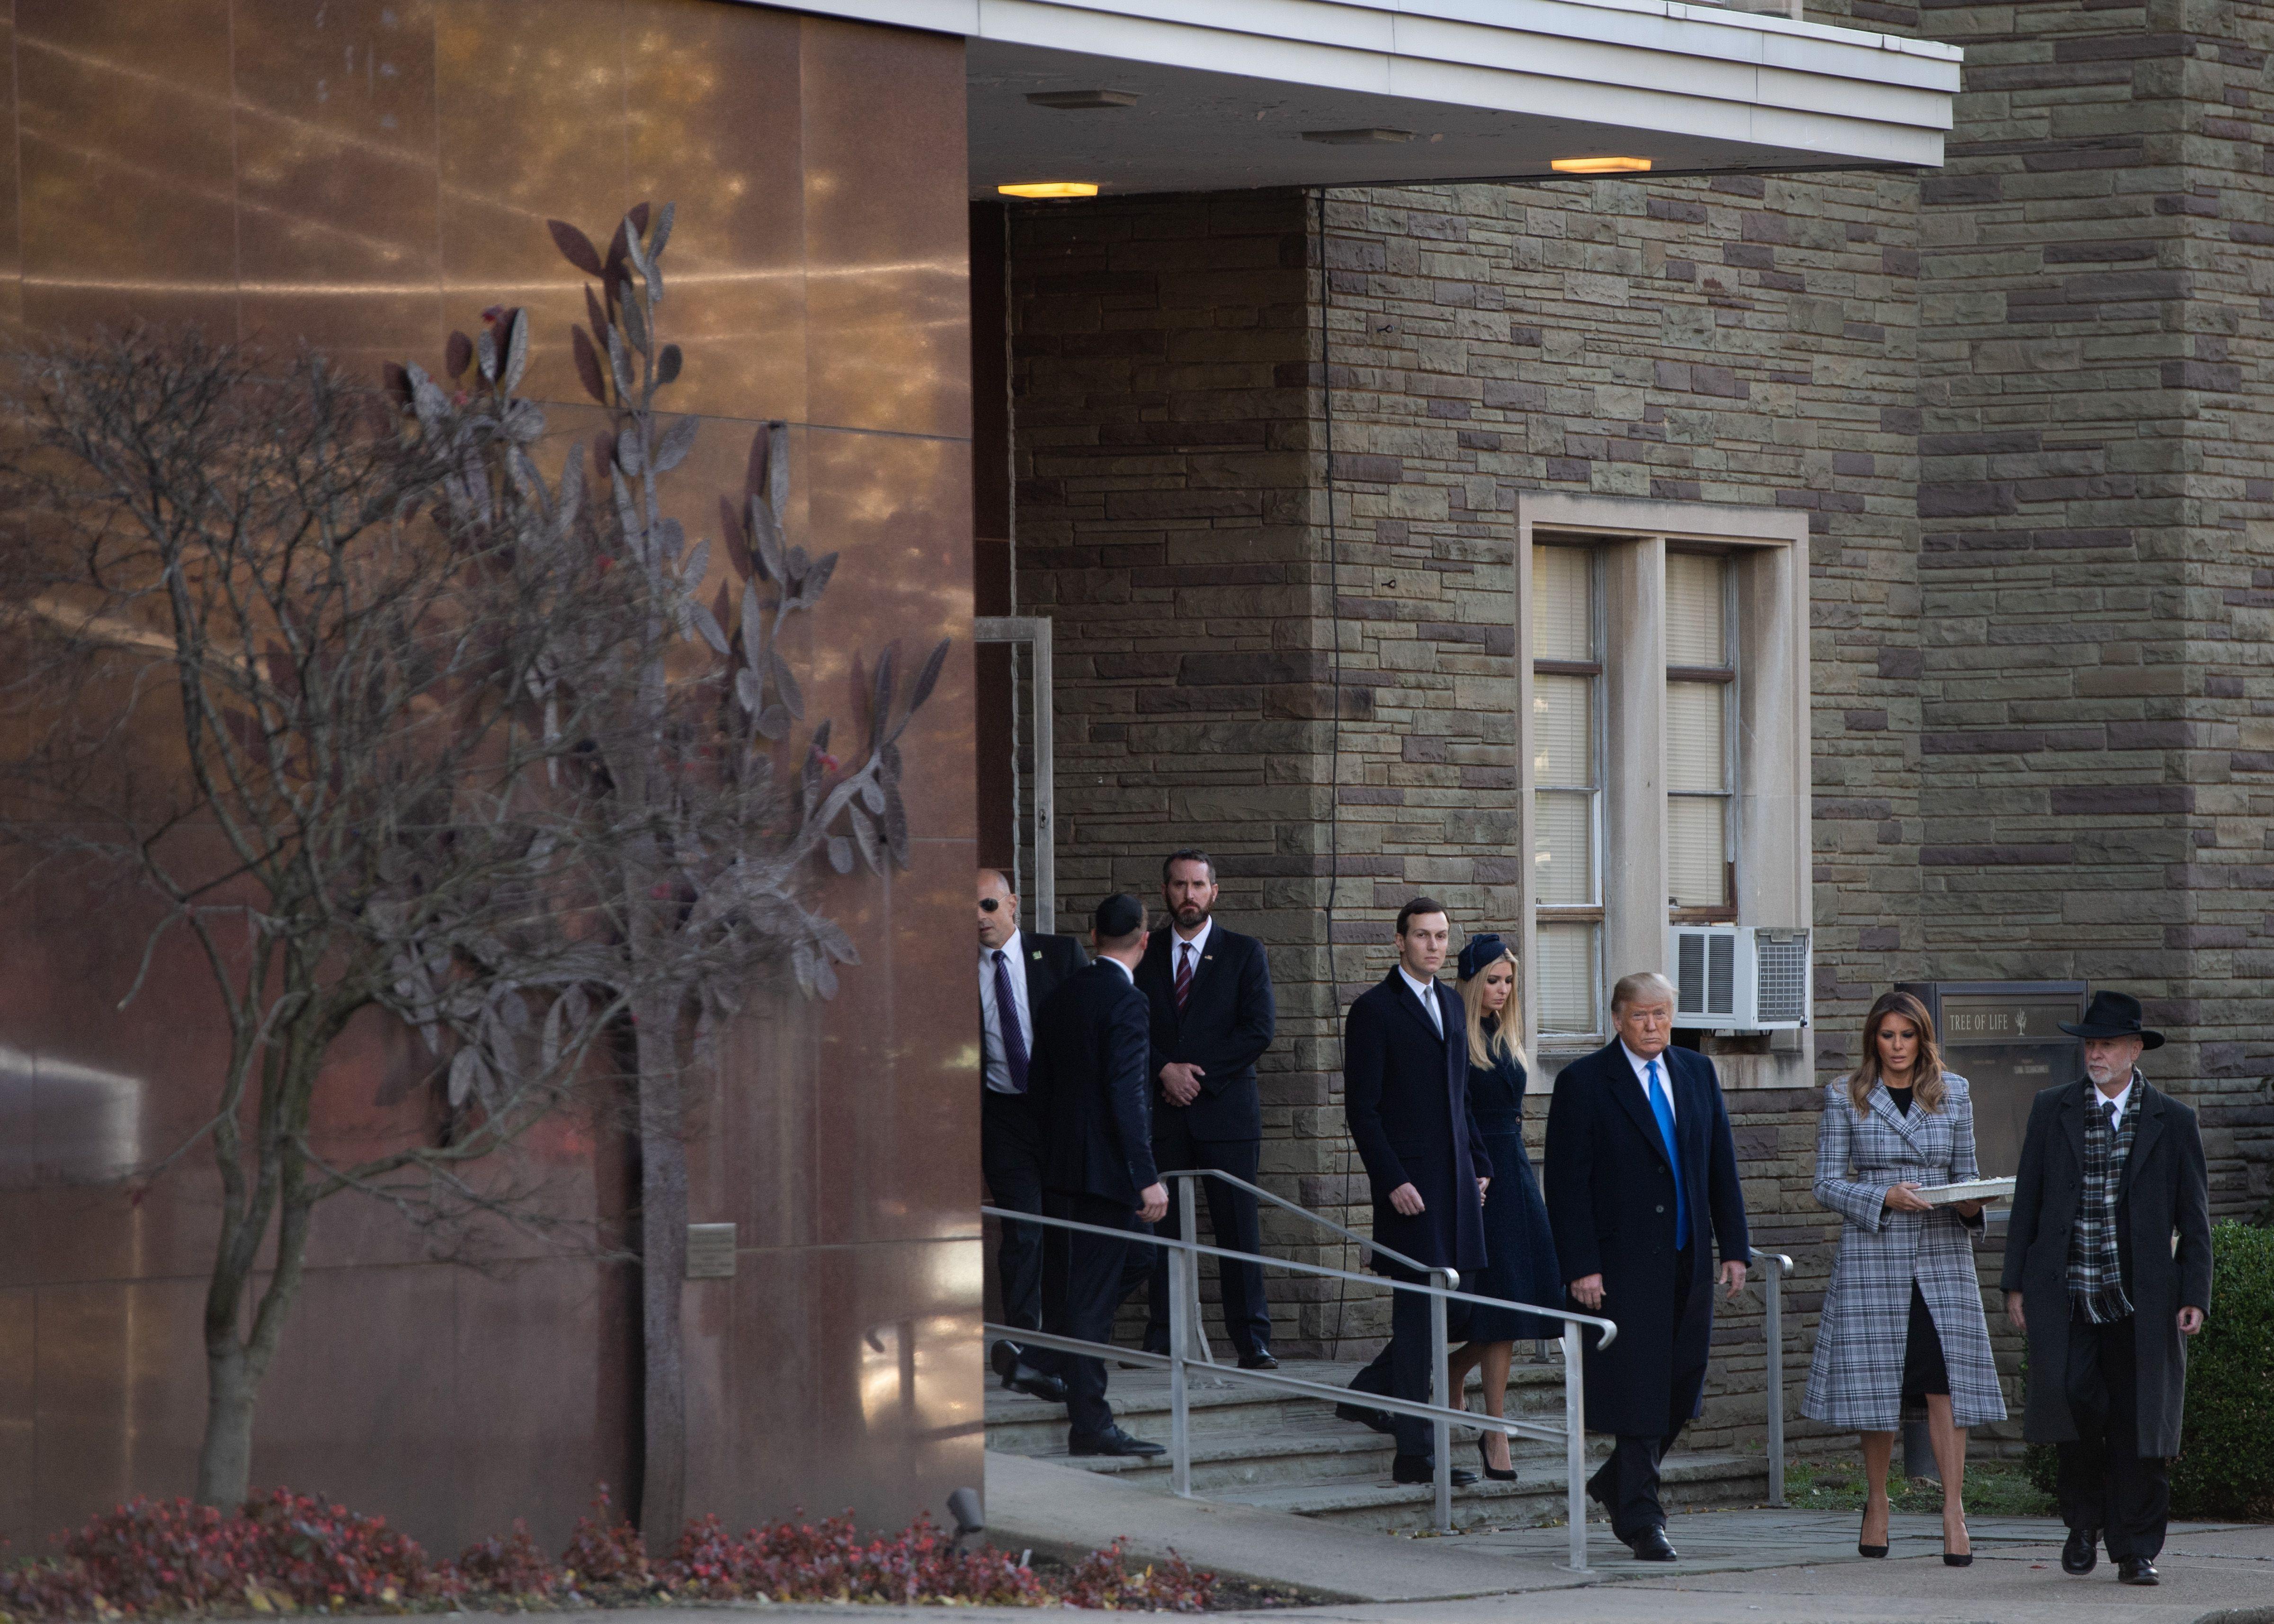 Trump, family exit synagogue.